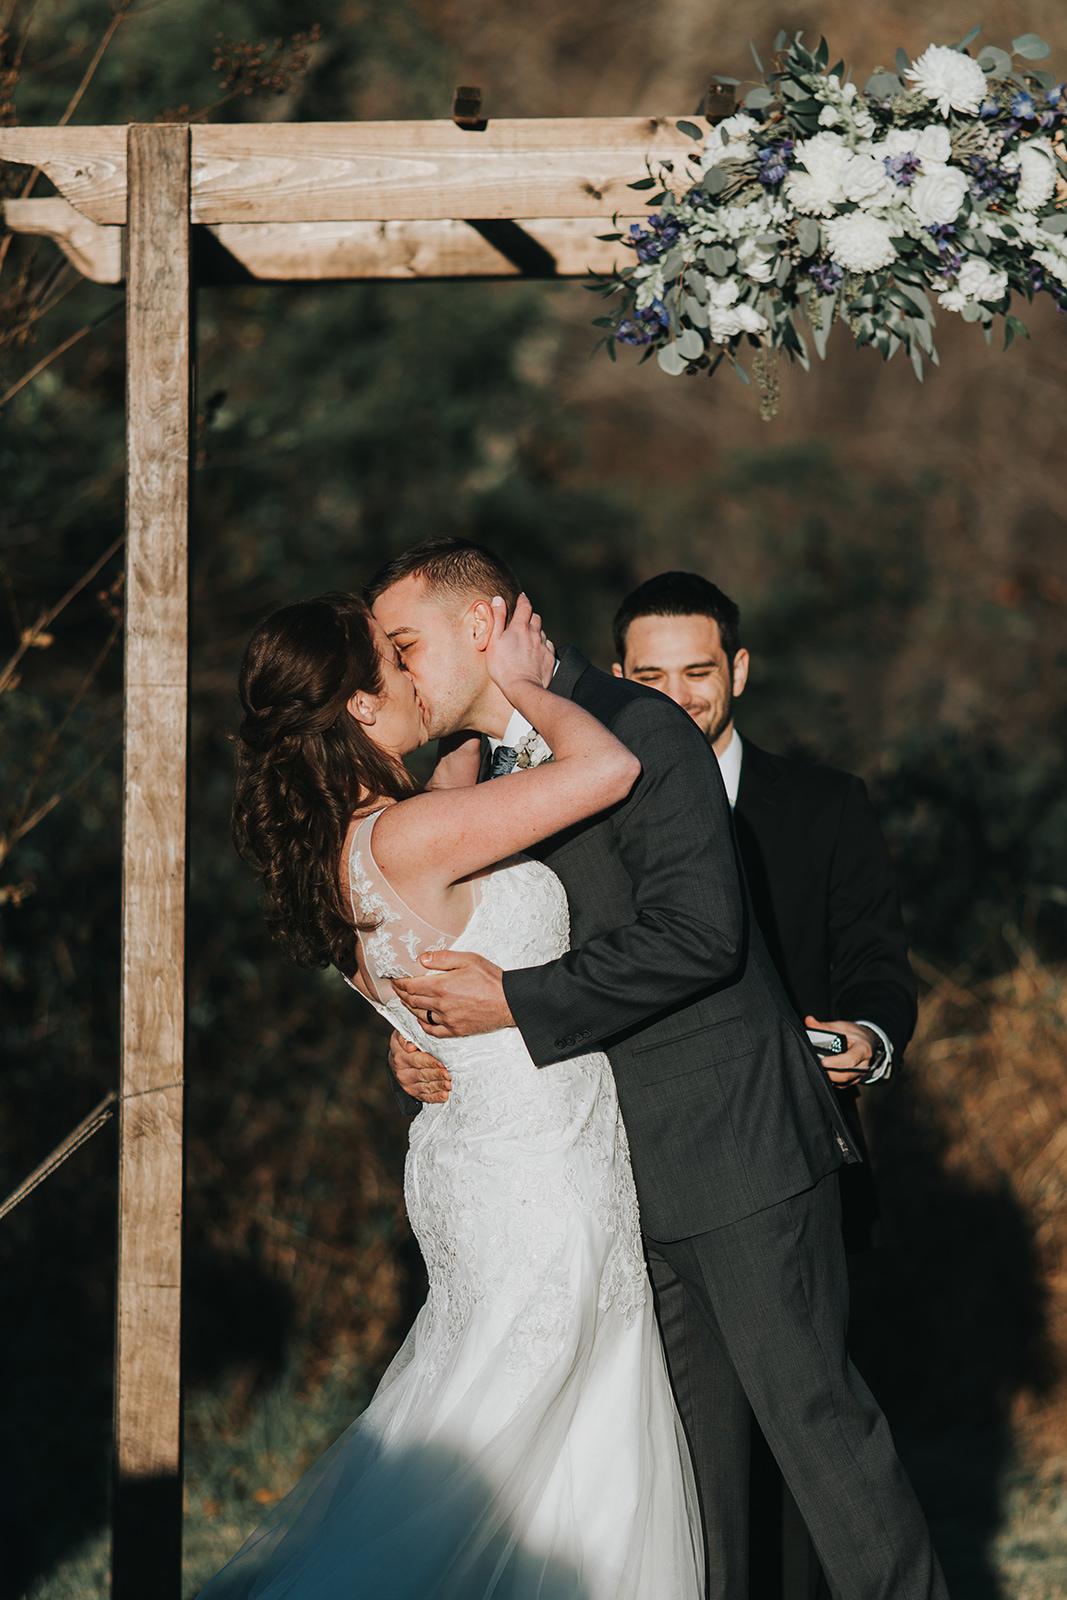 brielle-davis-events-48-fields-wedding-ceremony-kiss.jpg